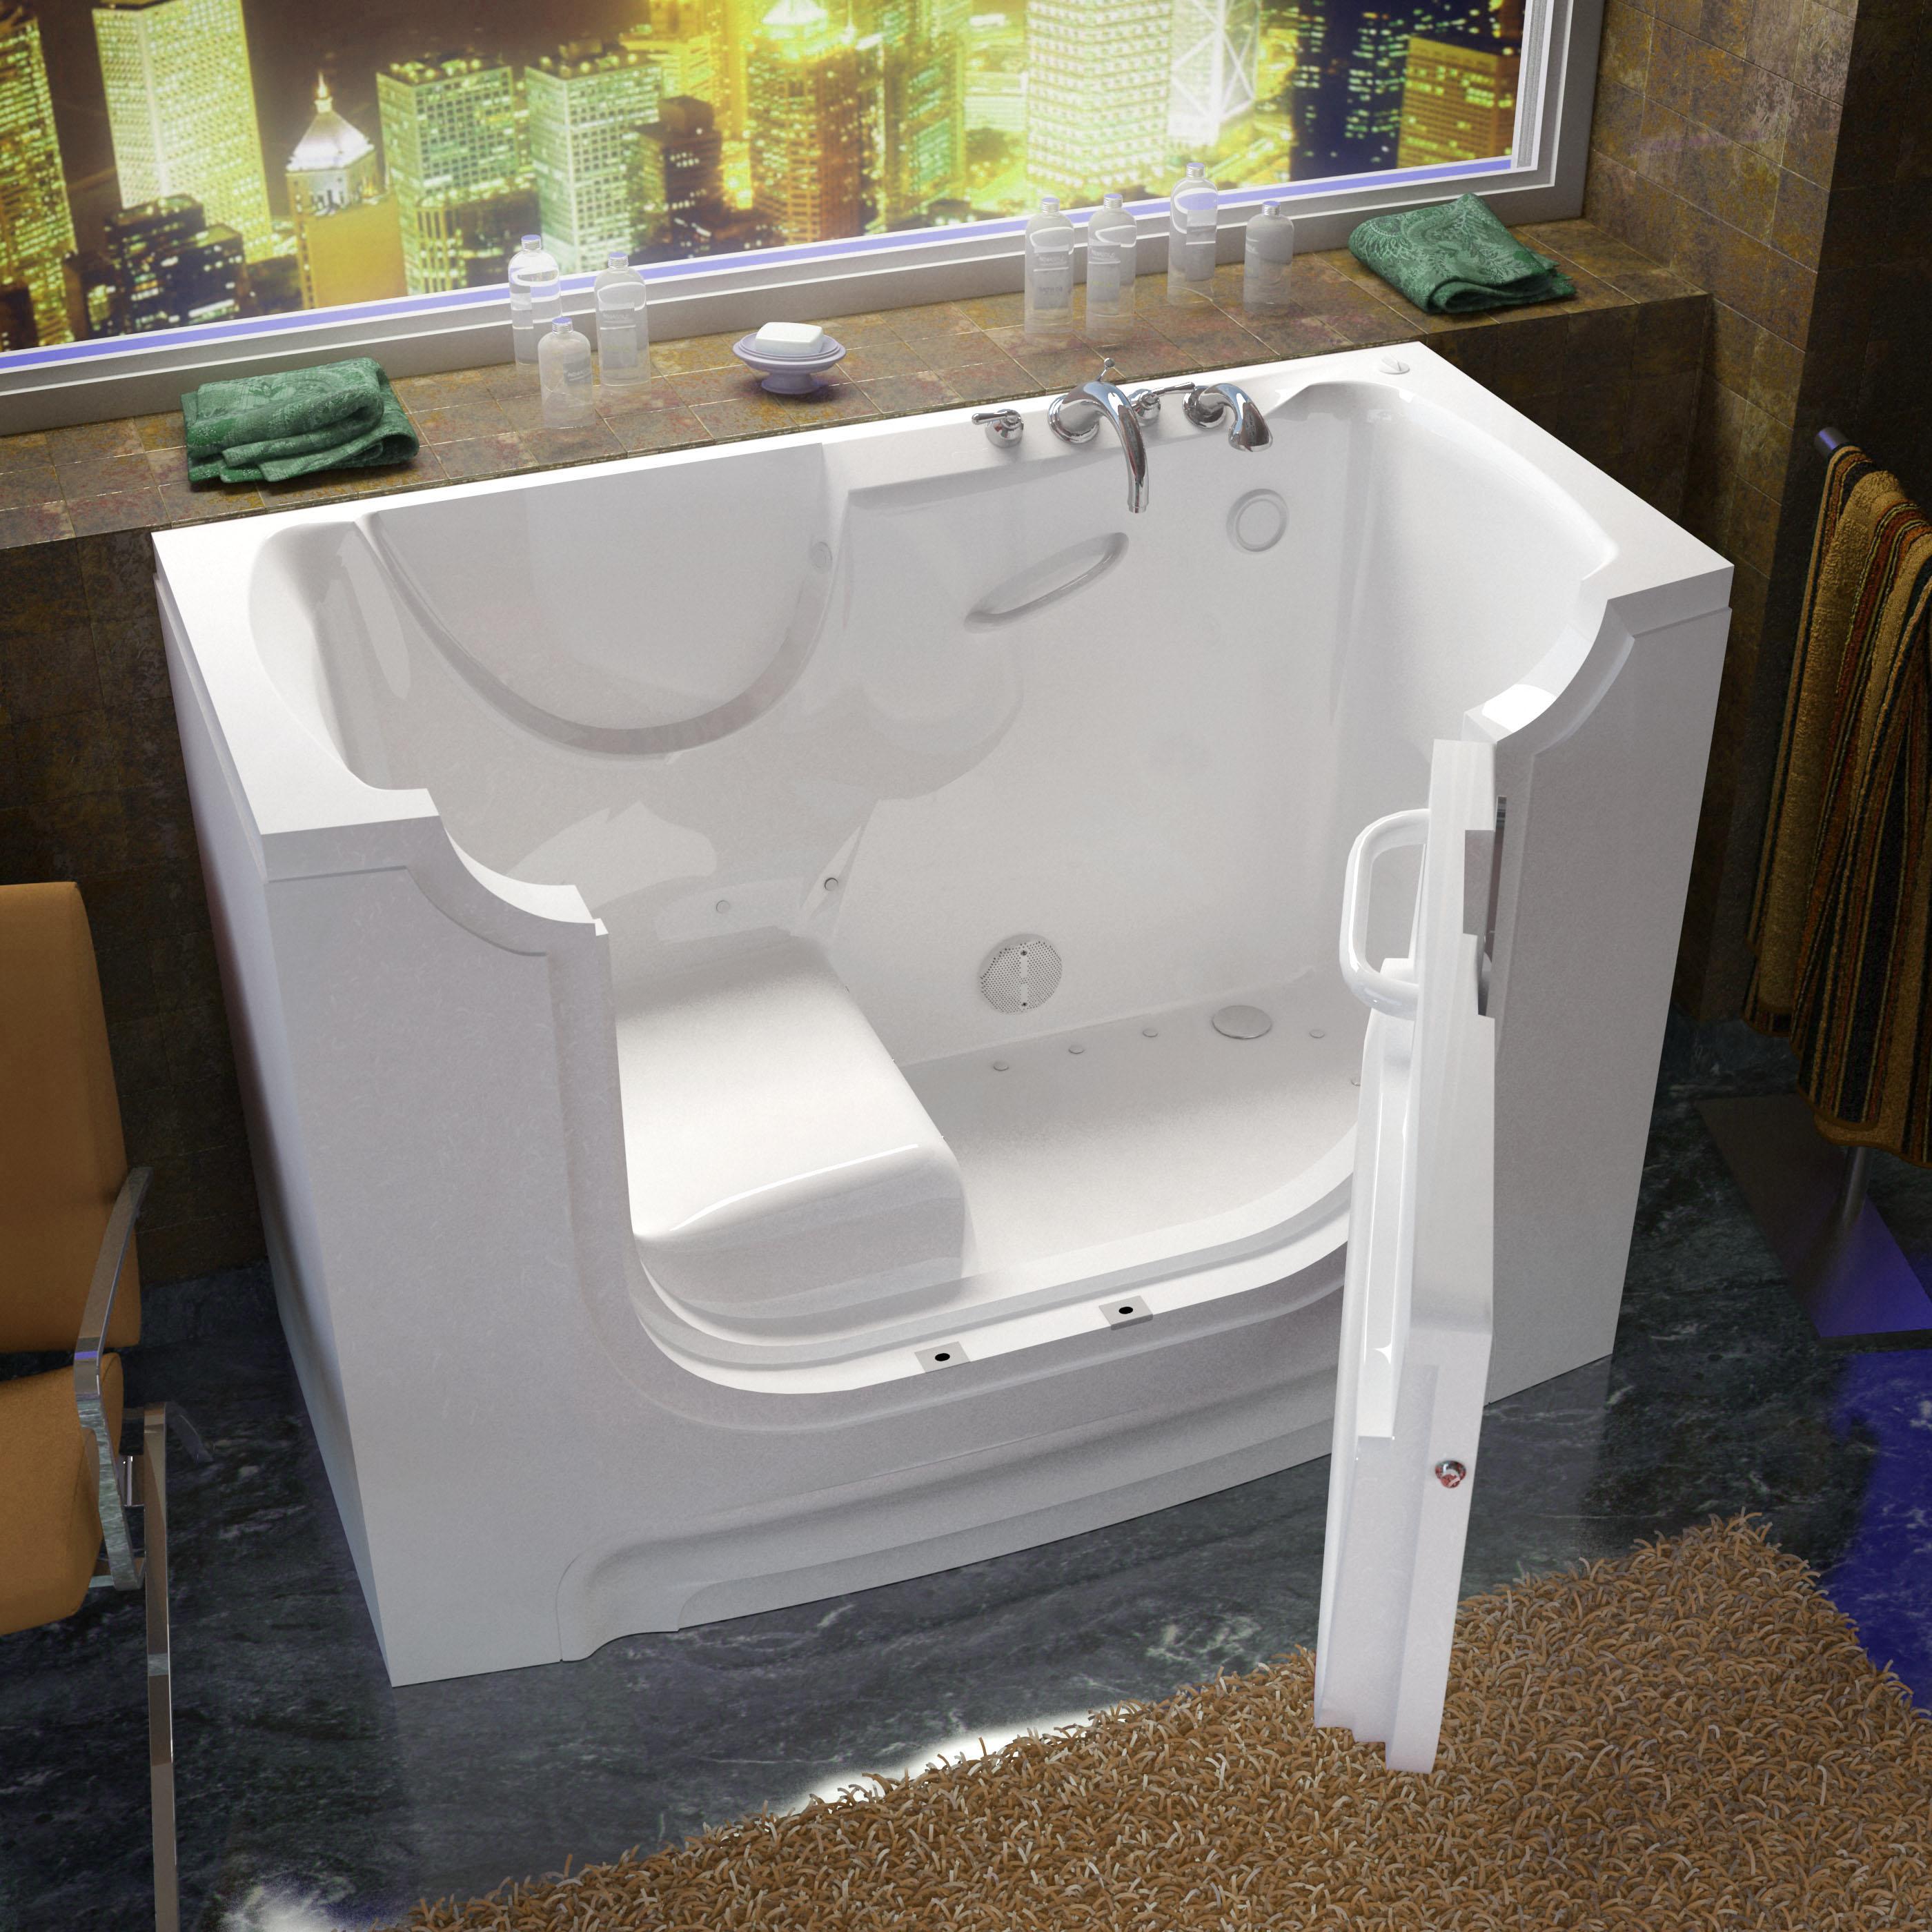 30x60 Right Drain White Air Jetted Wheelchair Accessible Walk-In Bathtub